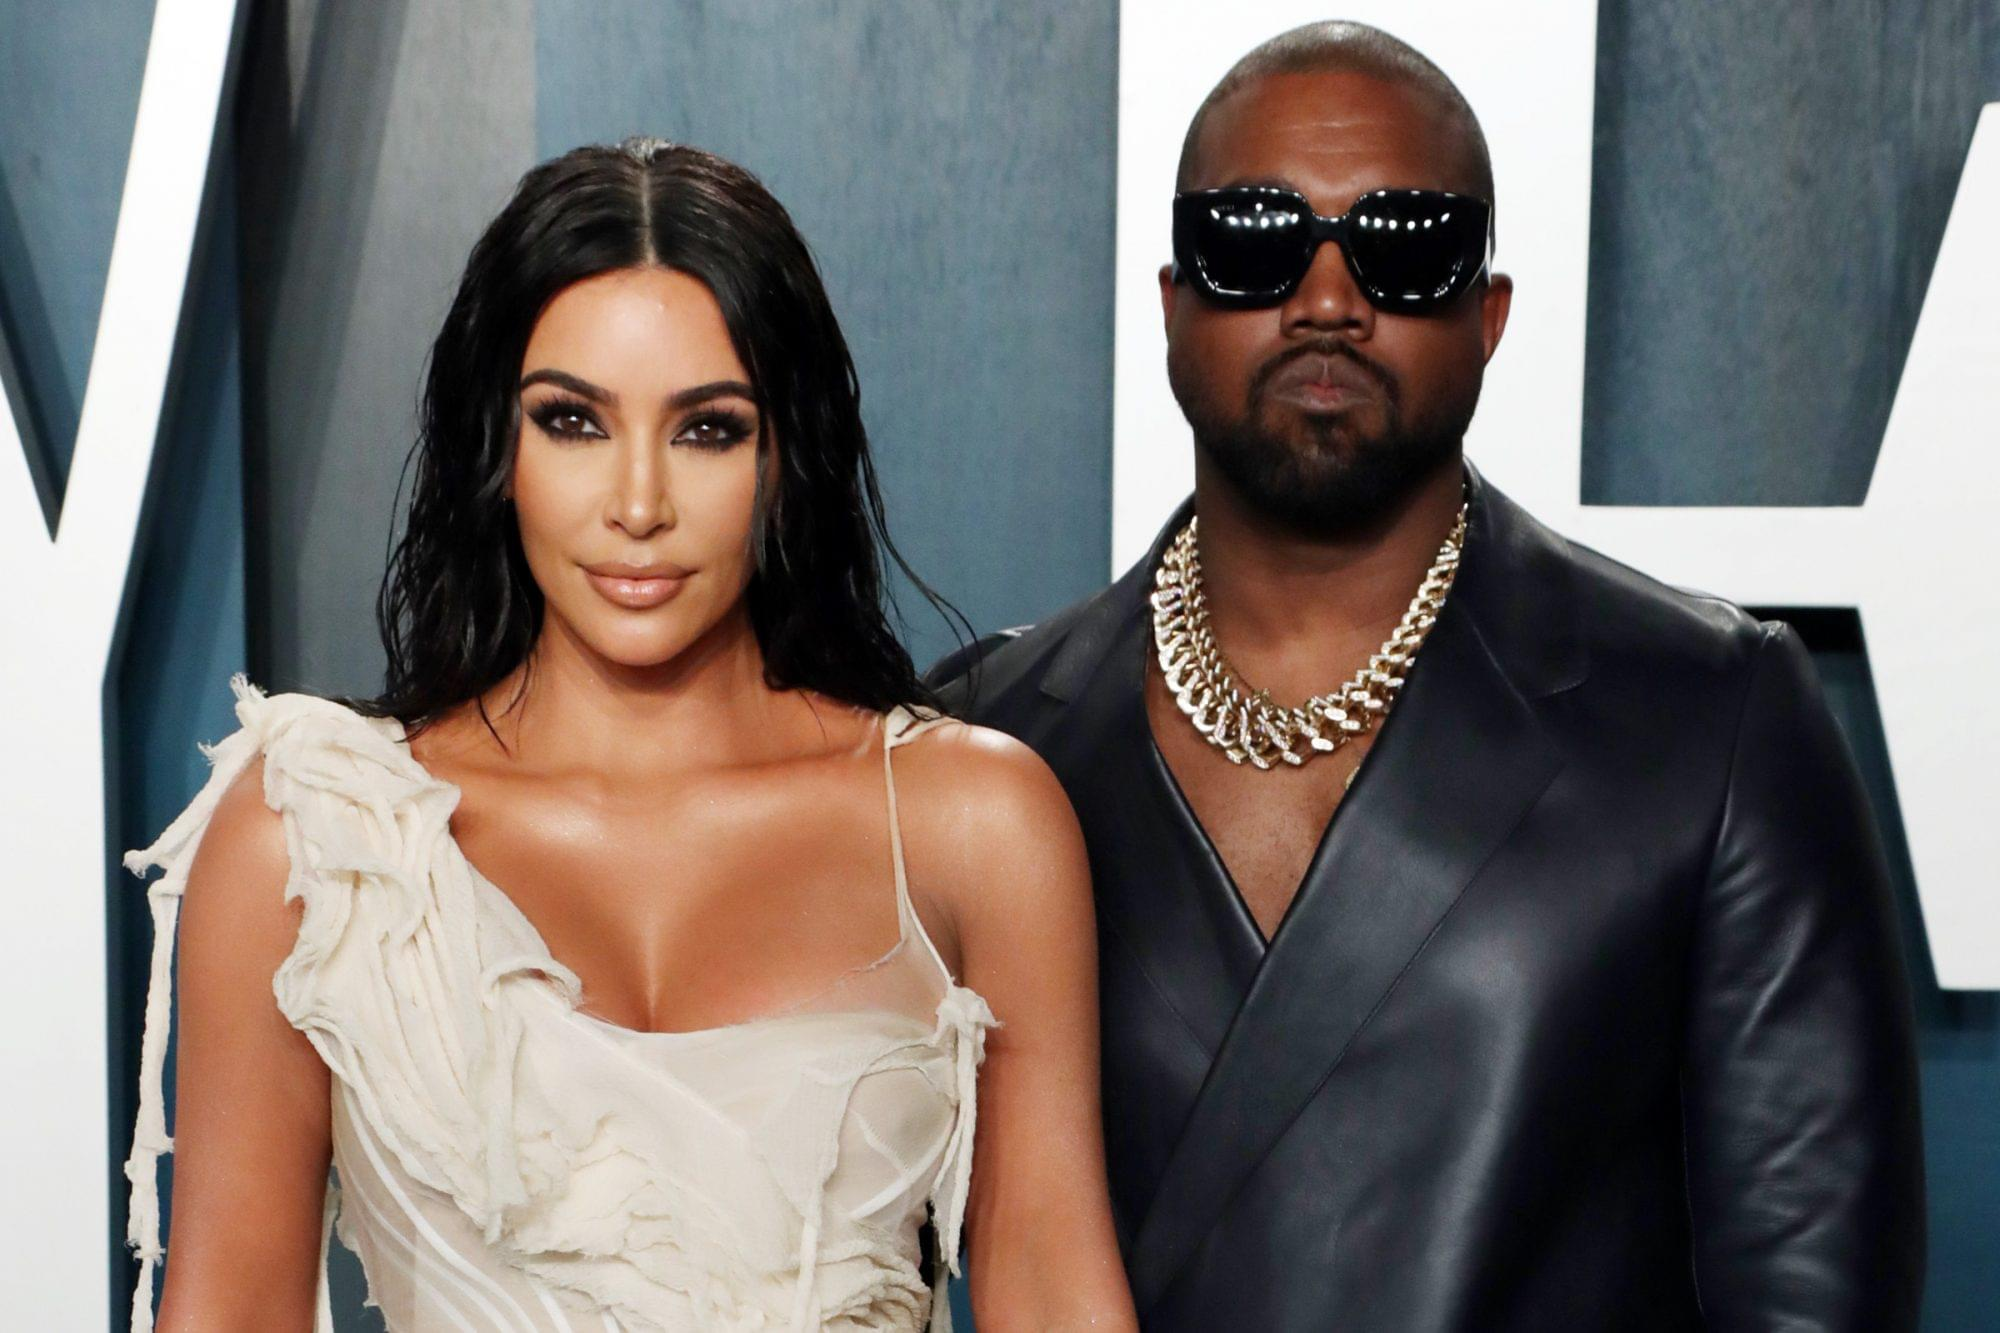 KANYE WEST: Apologizes to Kim